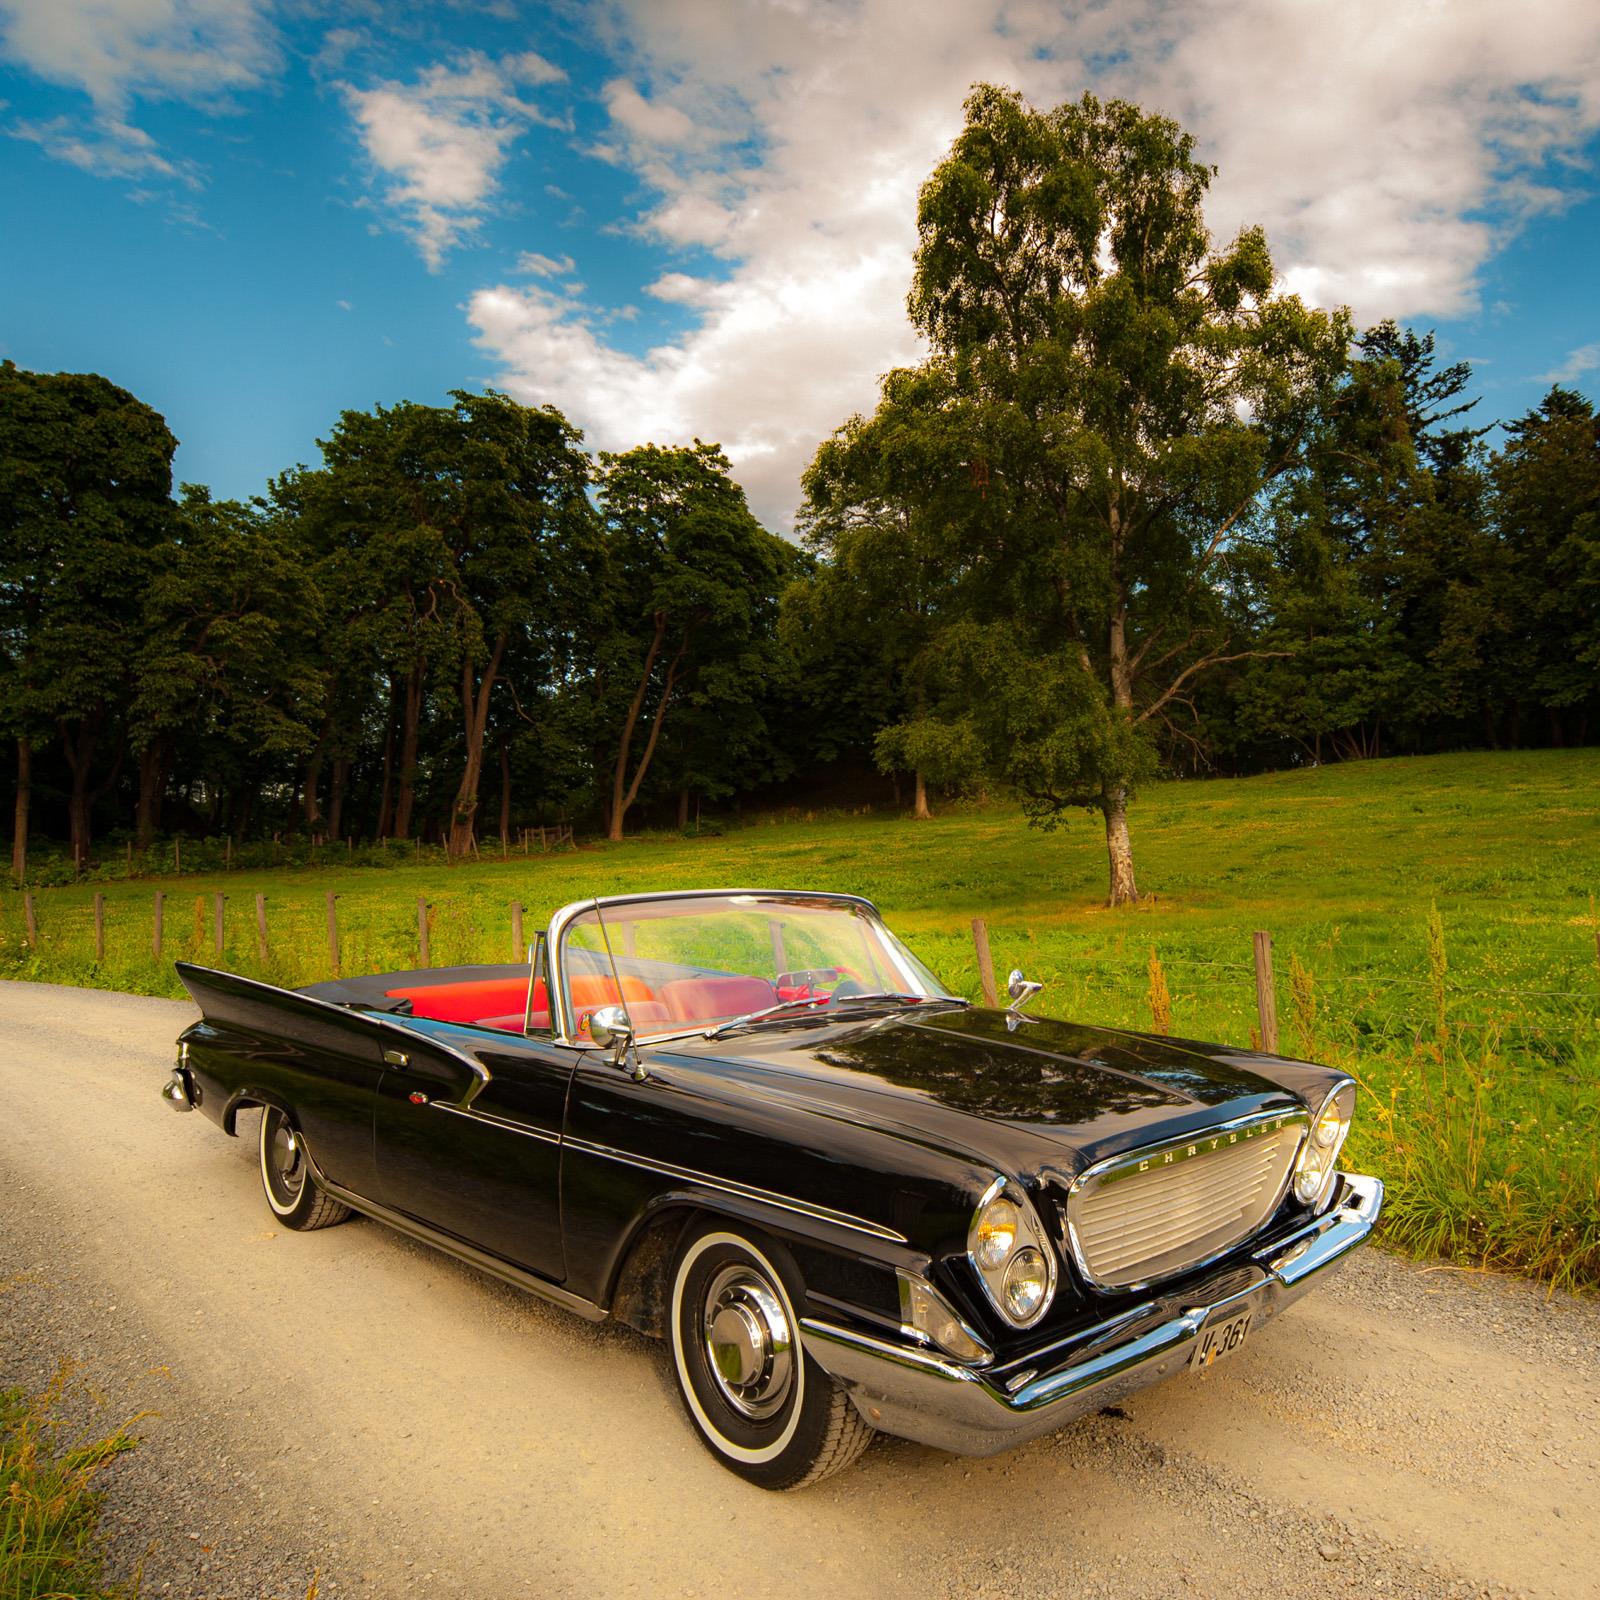 013-1961 Chrysler Newport Convertible 02. Eier- me